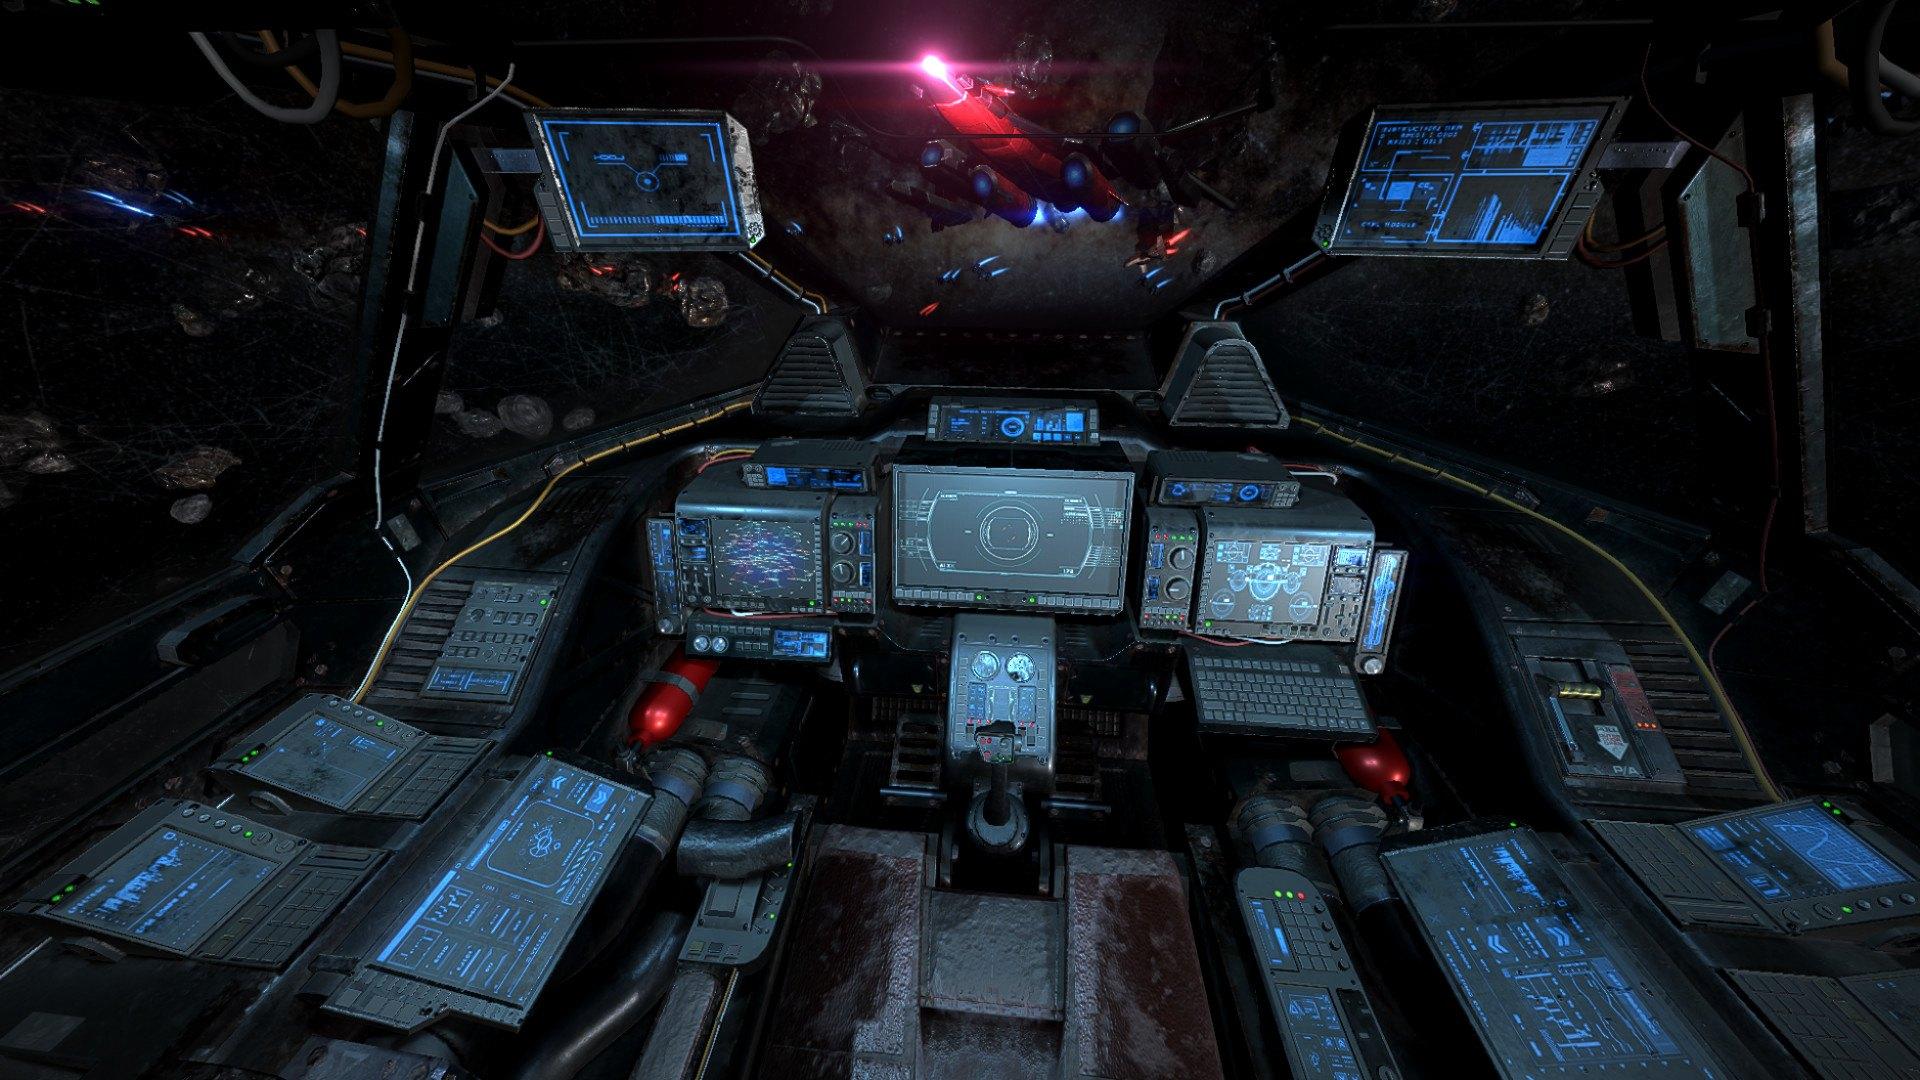 Space Battle Vr Steam Cd Key